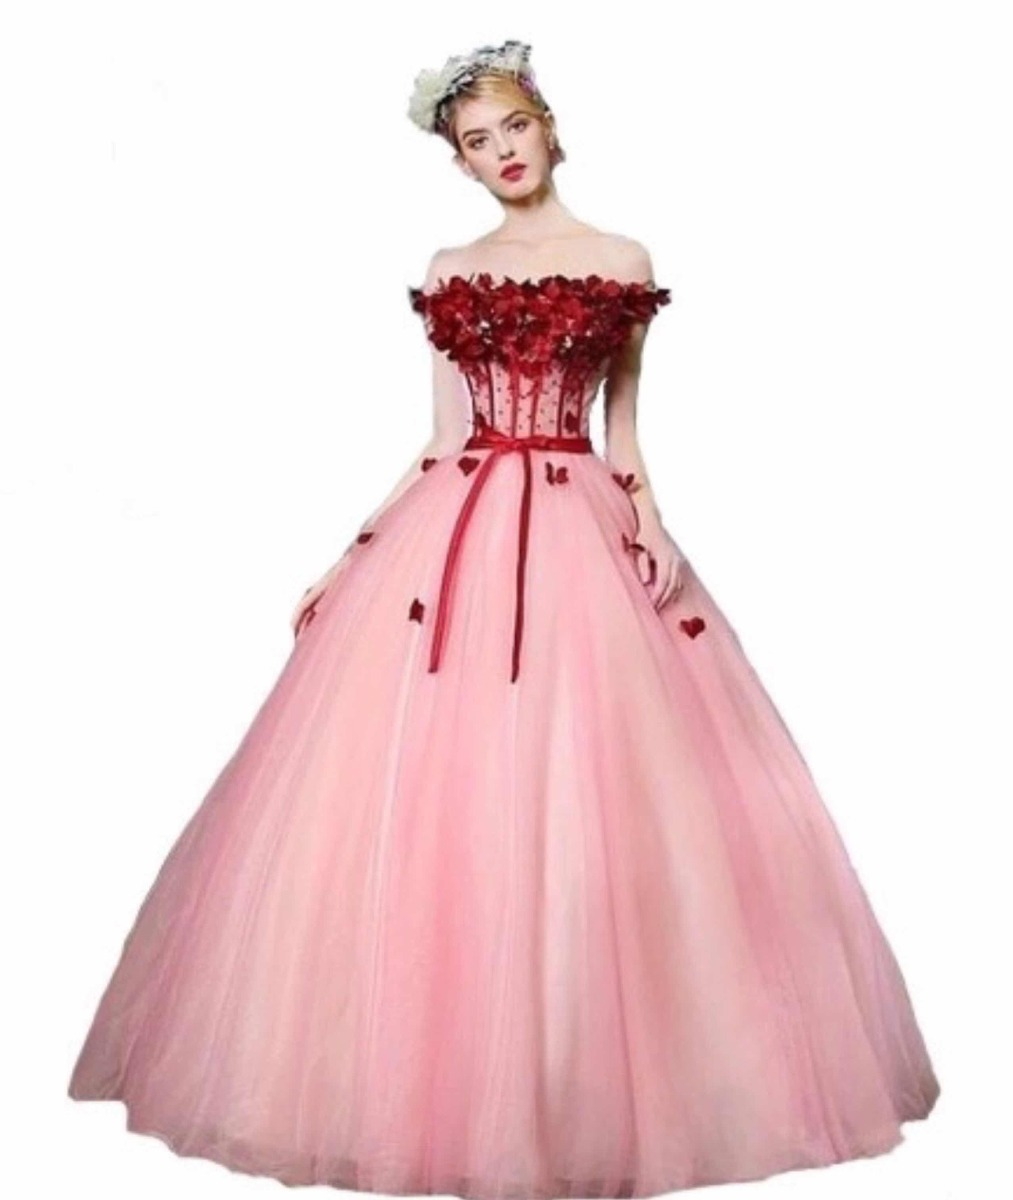 hermoso vestido de xv a os 15 rosa vino flores 3d vintage. Black Bedroom Furniture Sets. Home Design Ideas